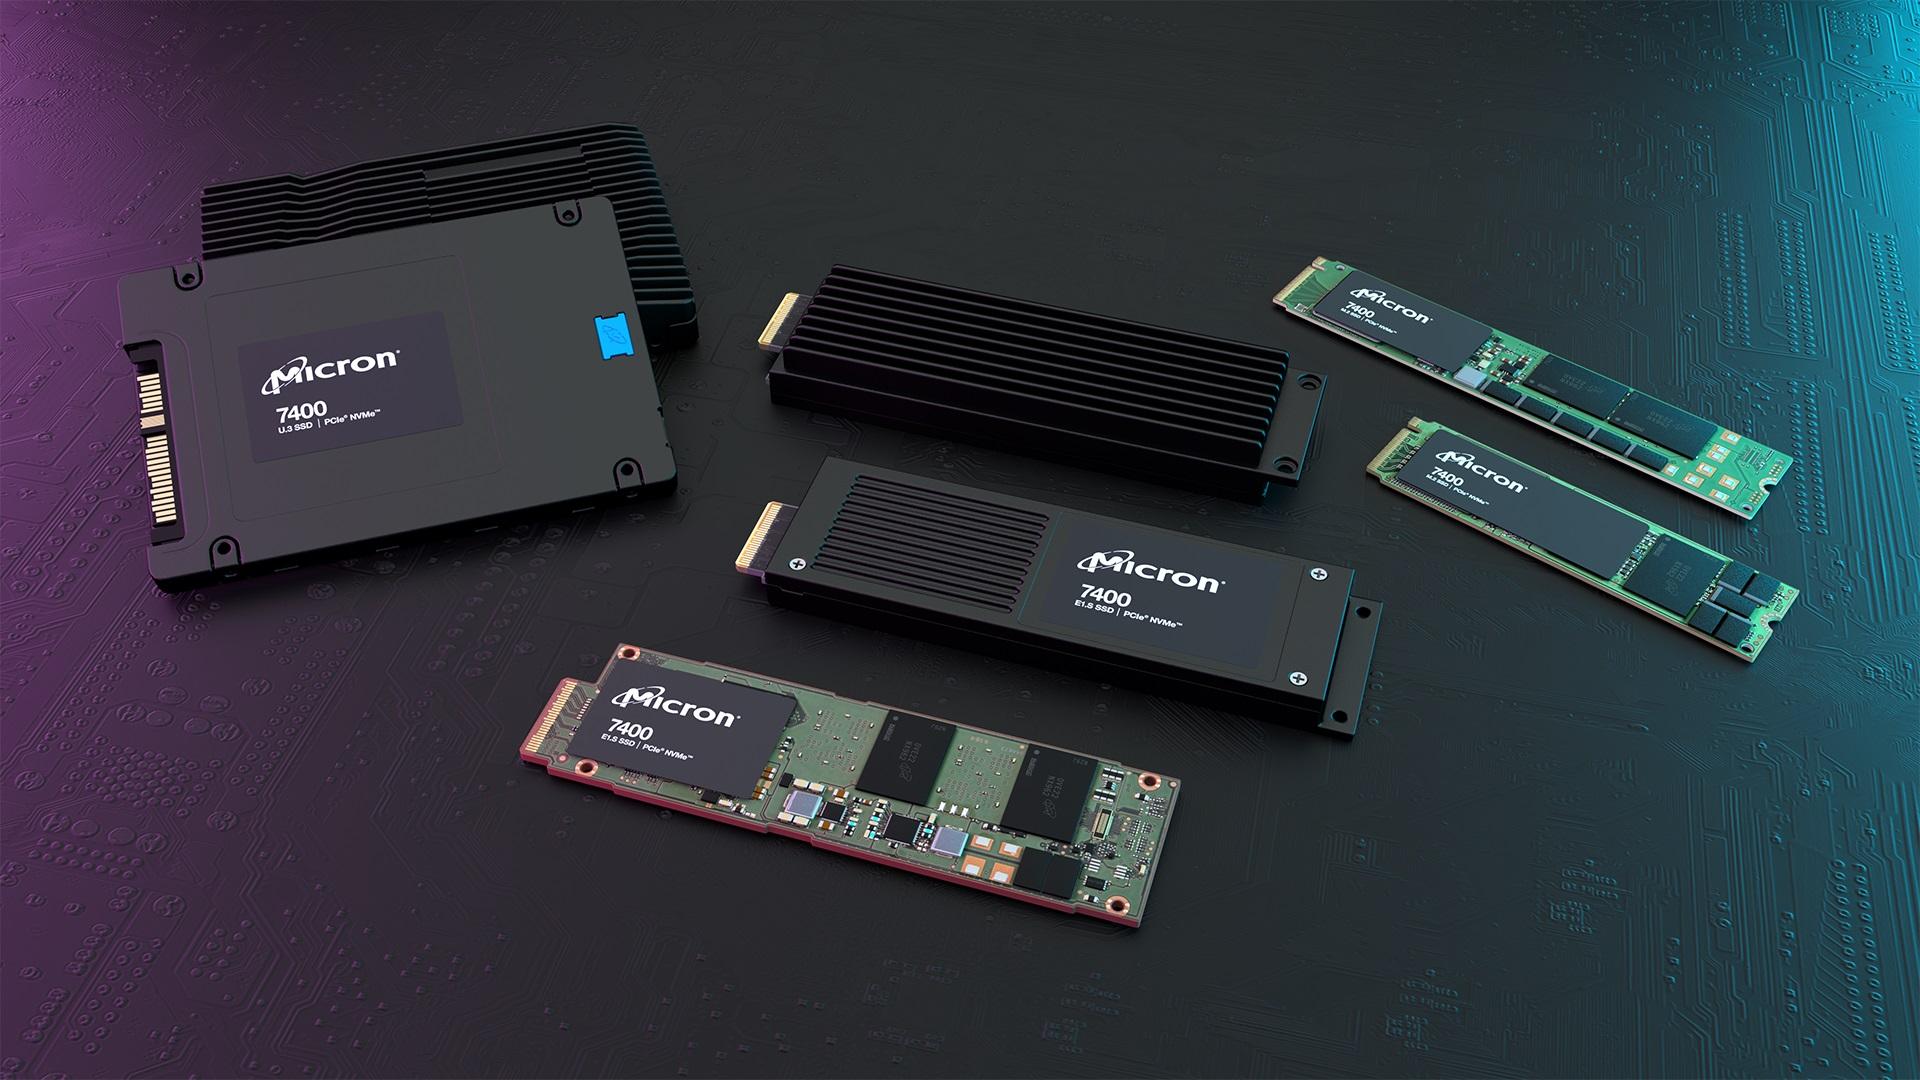 Micron 7400 SSDs